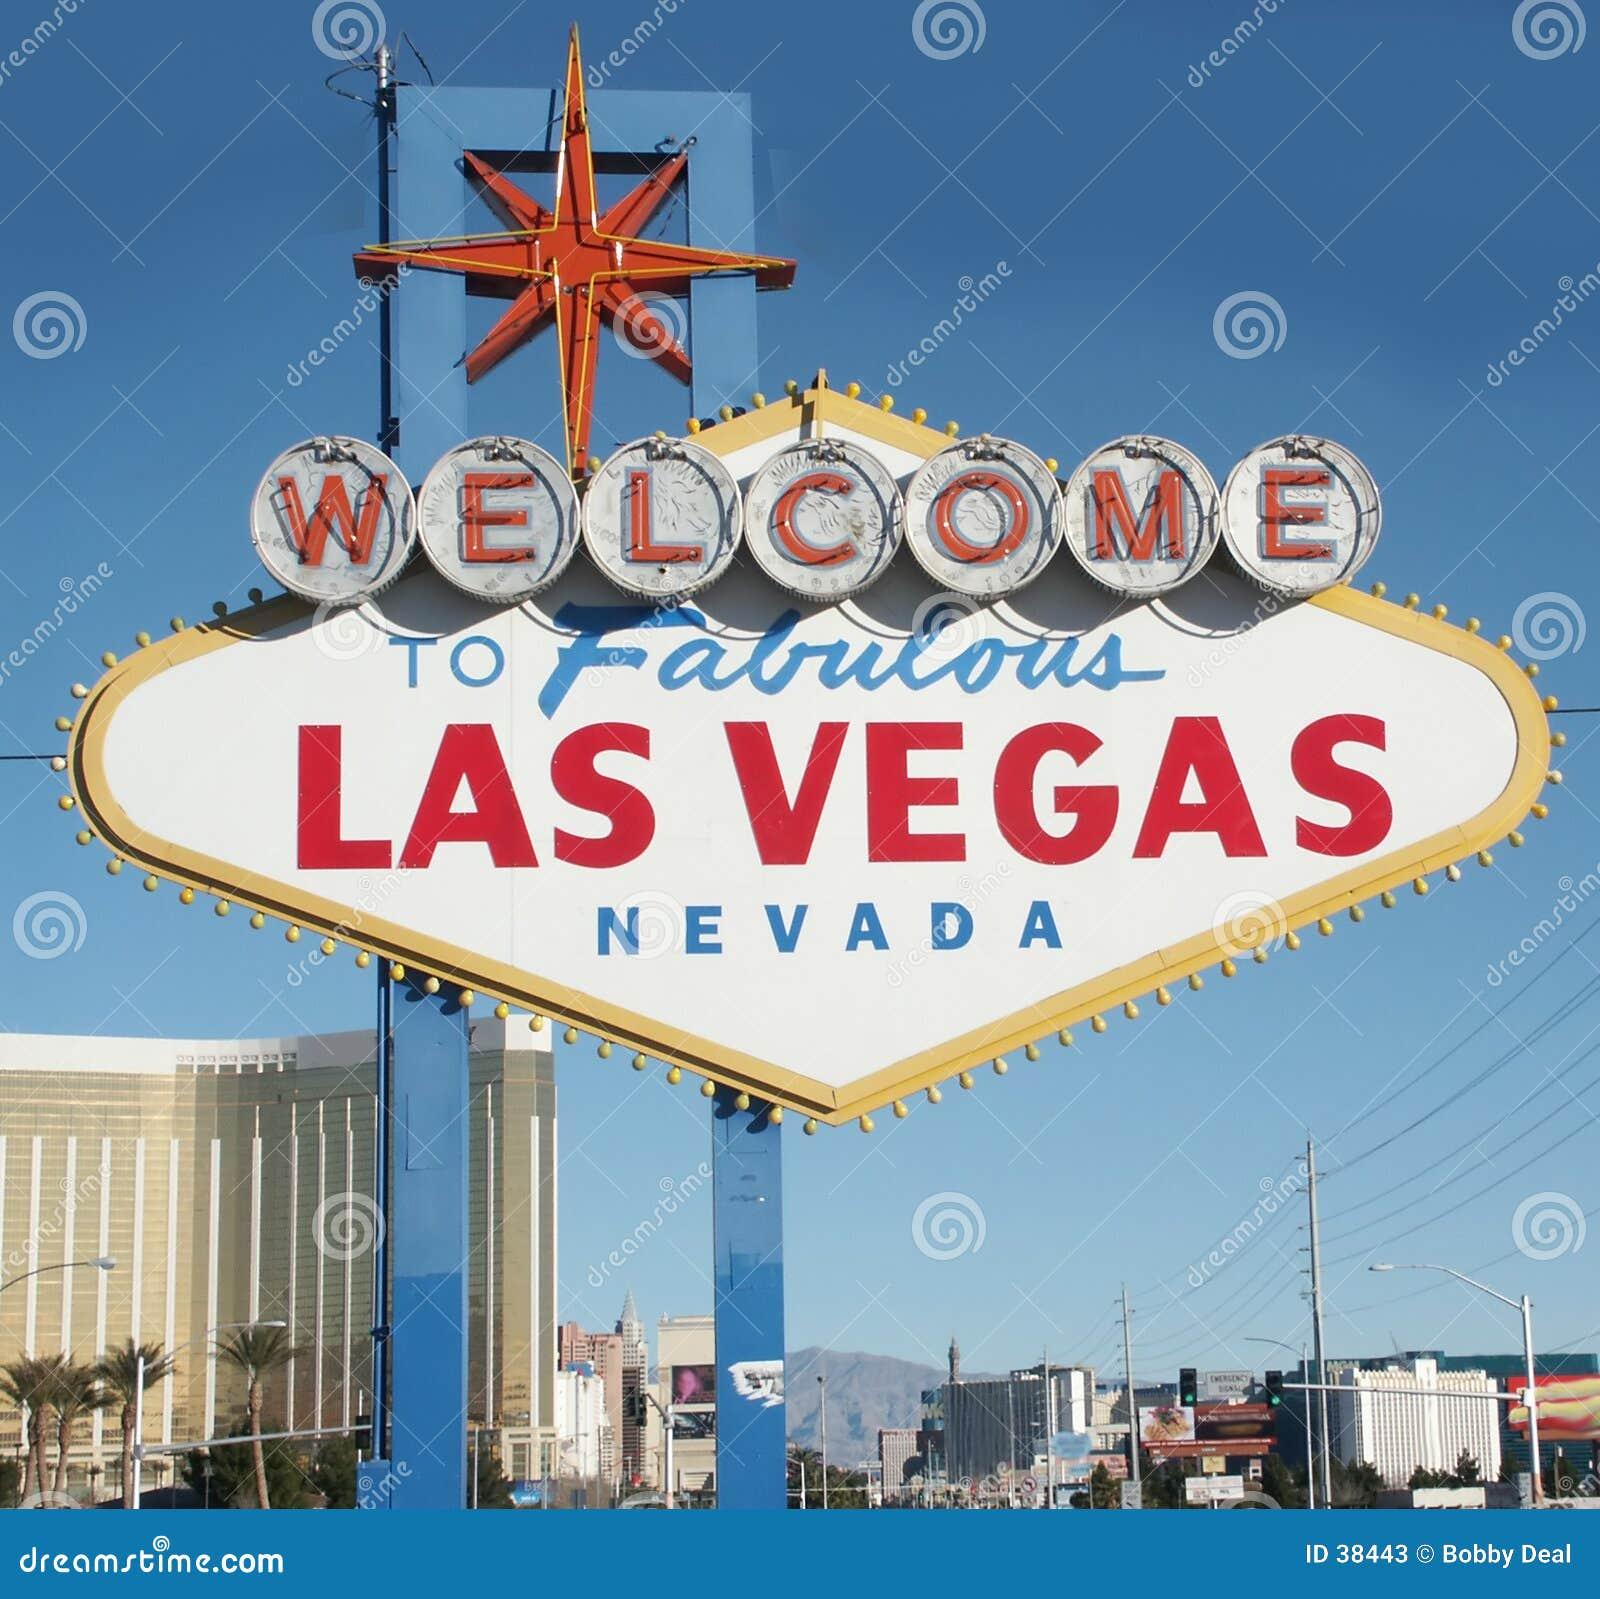 Vegas, lasy